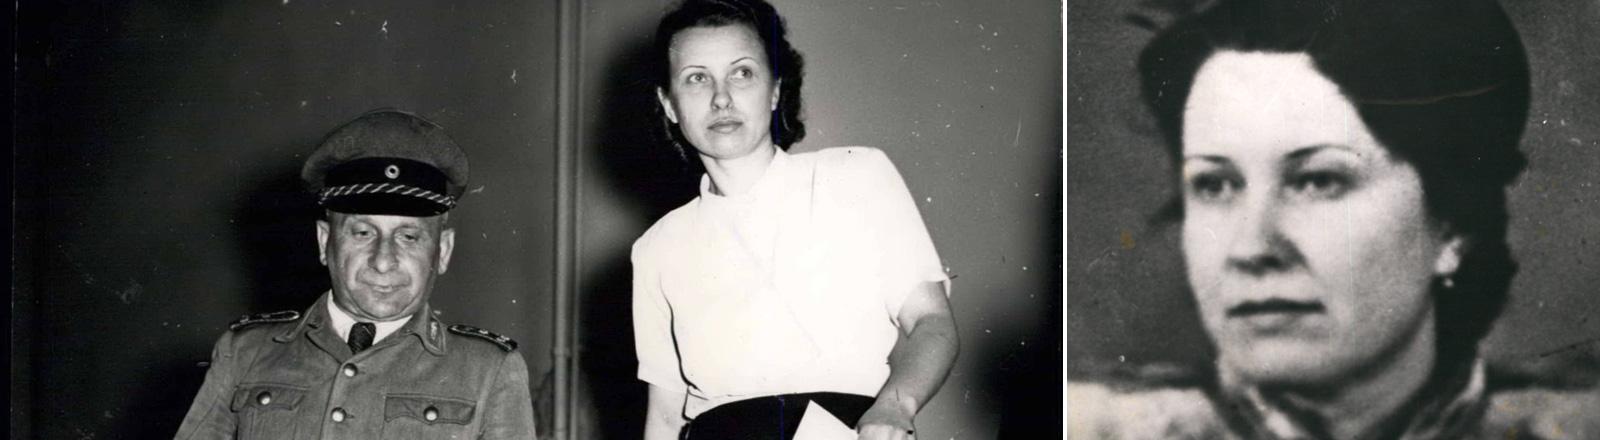 Olga Robine alias die Rote Olga vor ihrem Prozess in Lüneburg